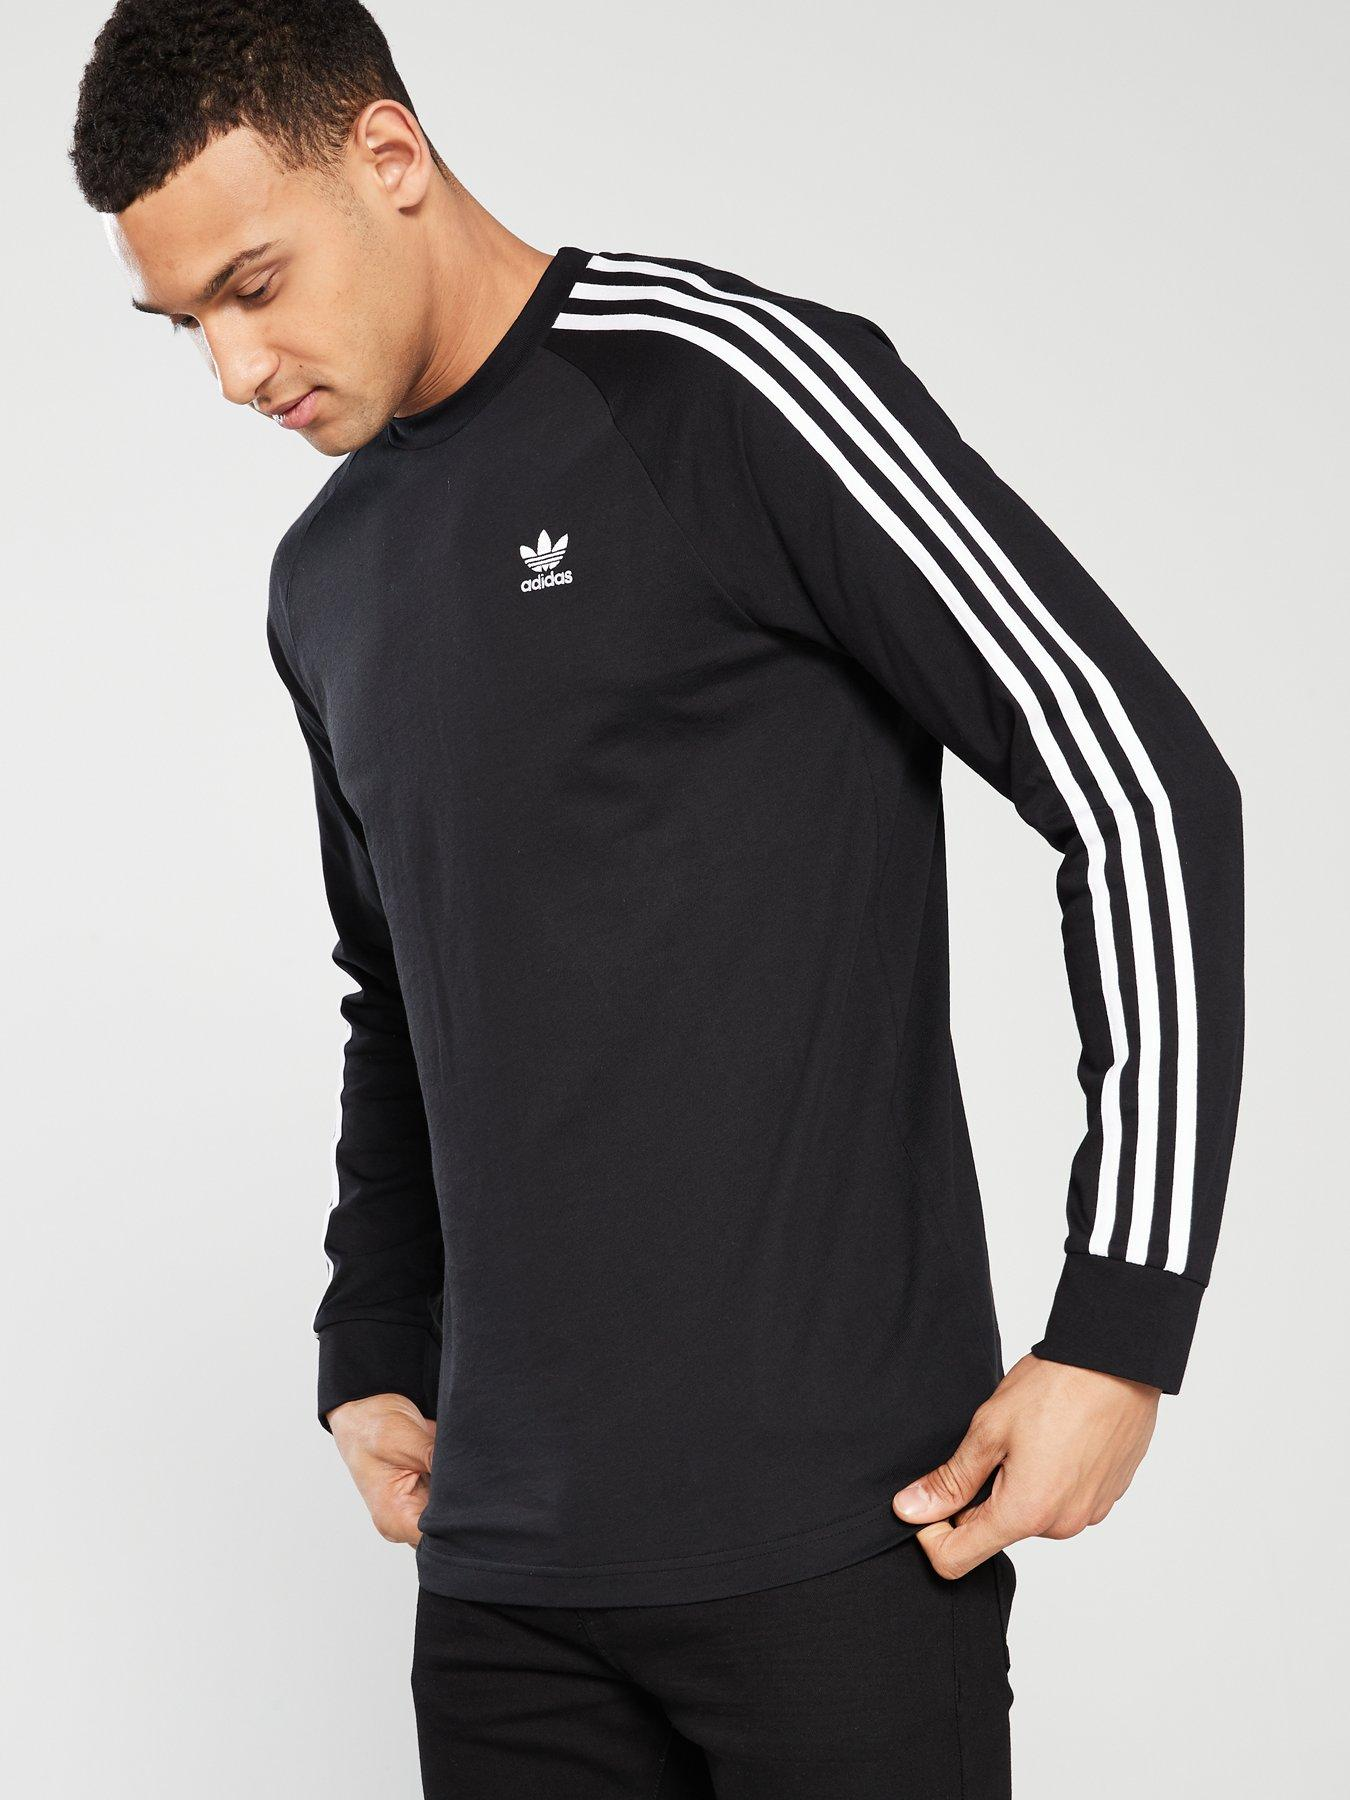 adidas 3 stripe black long sleeve t shirt